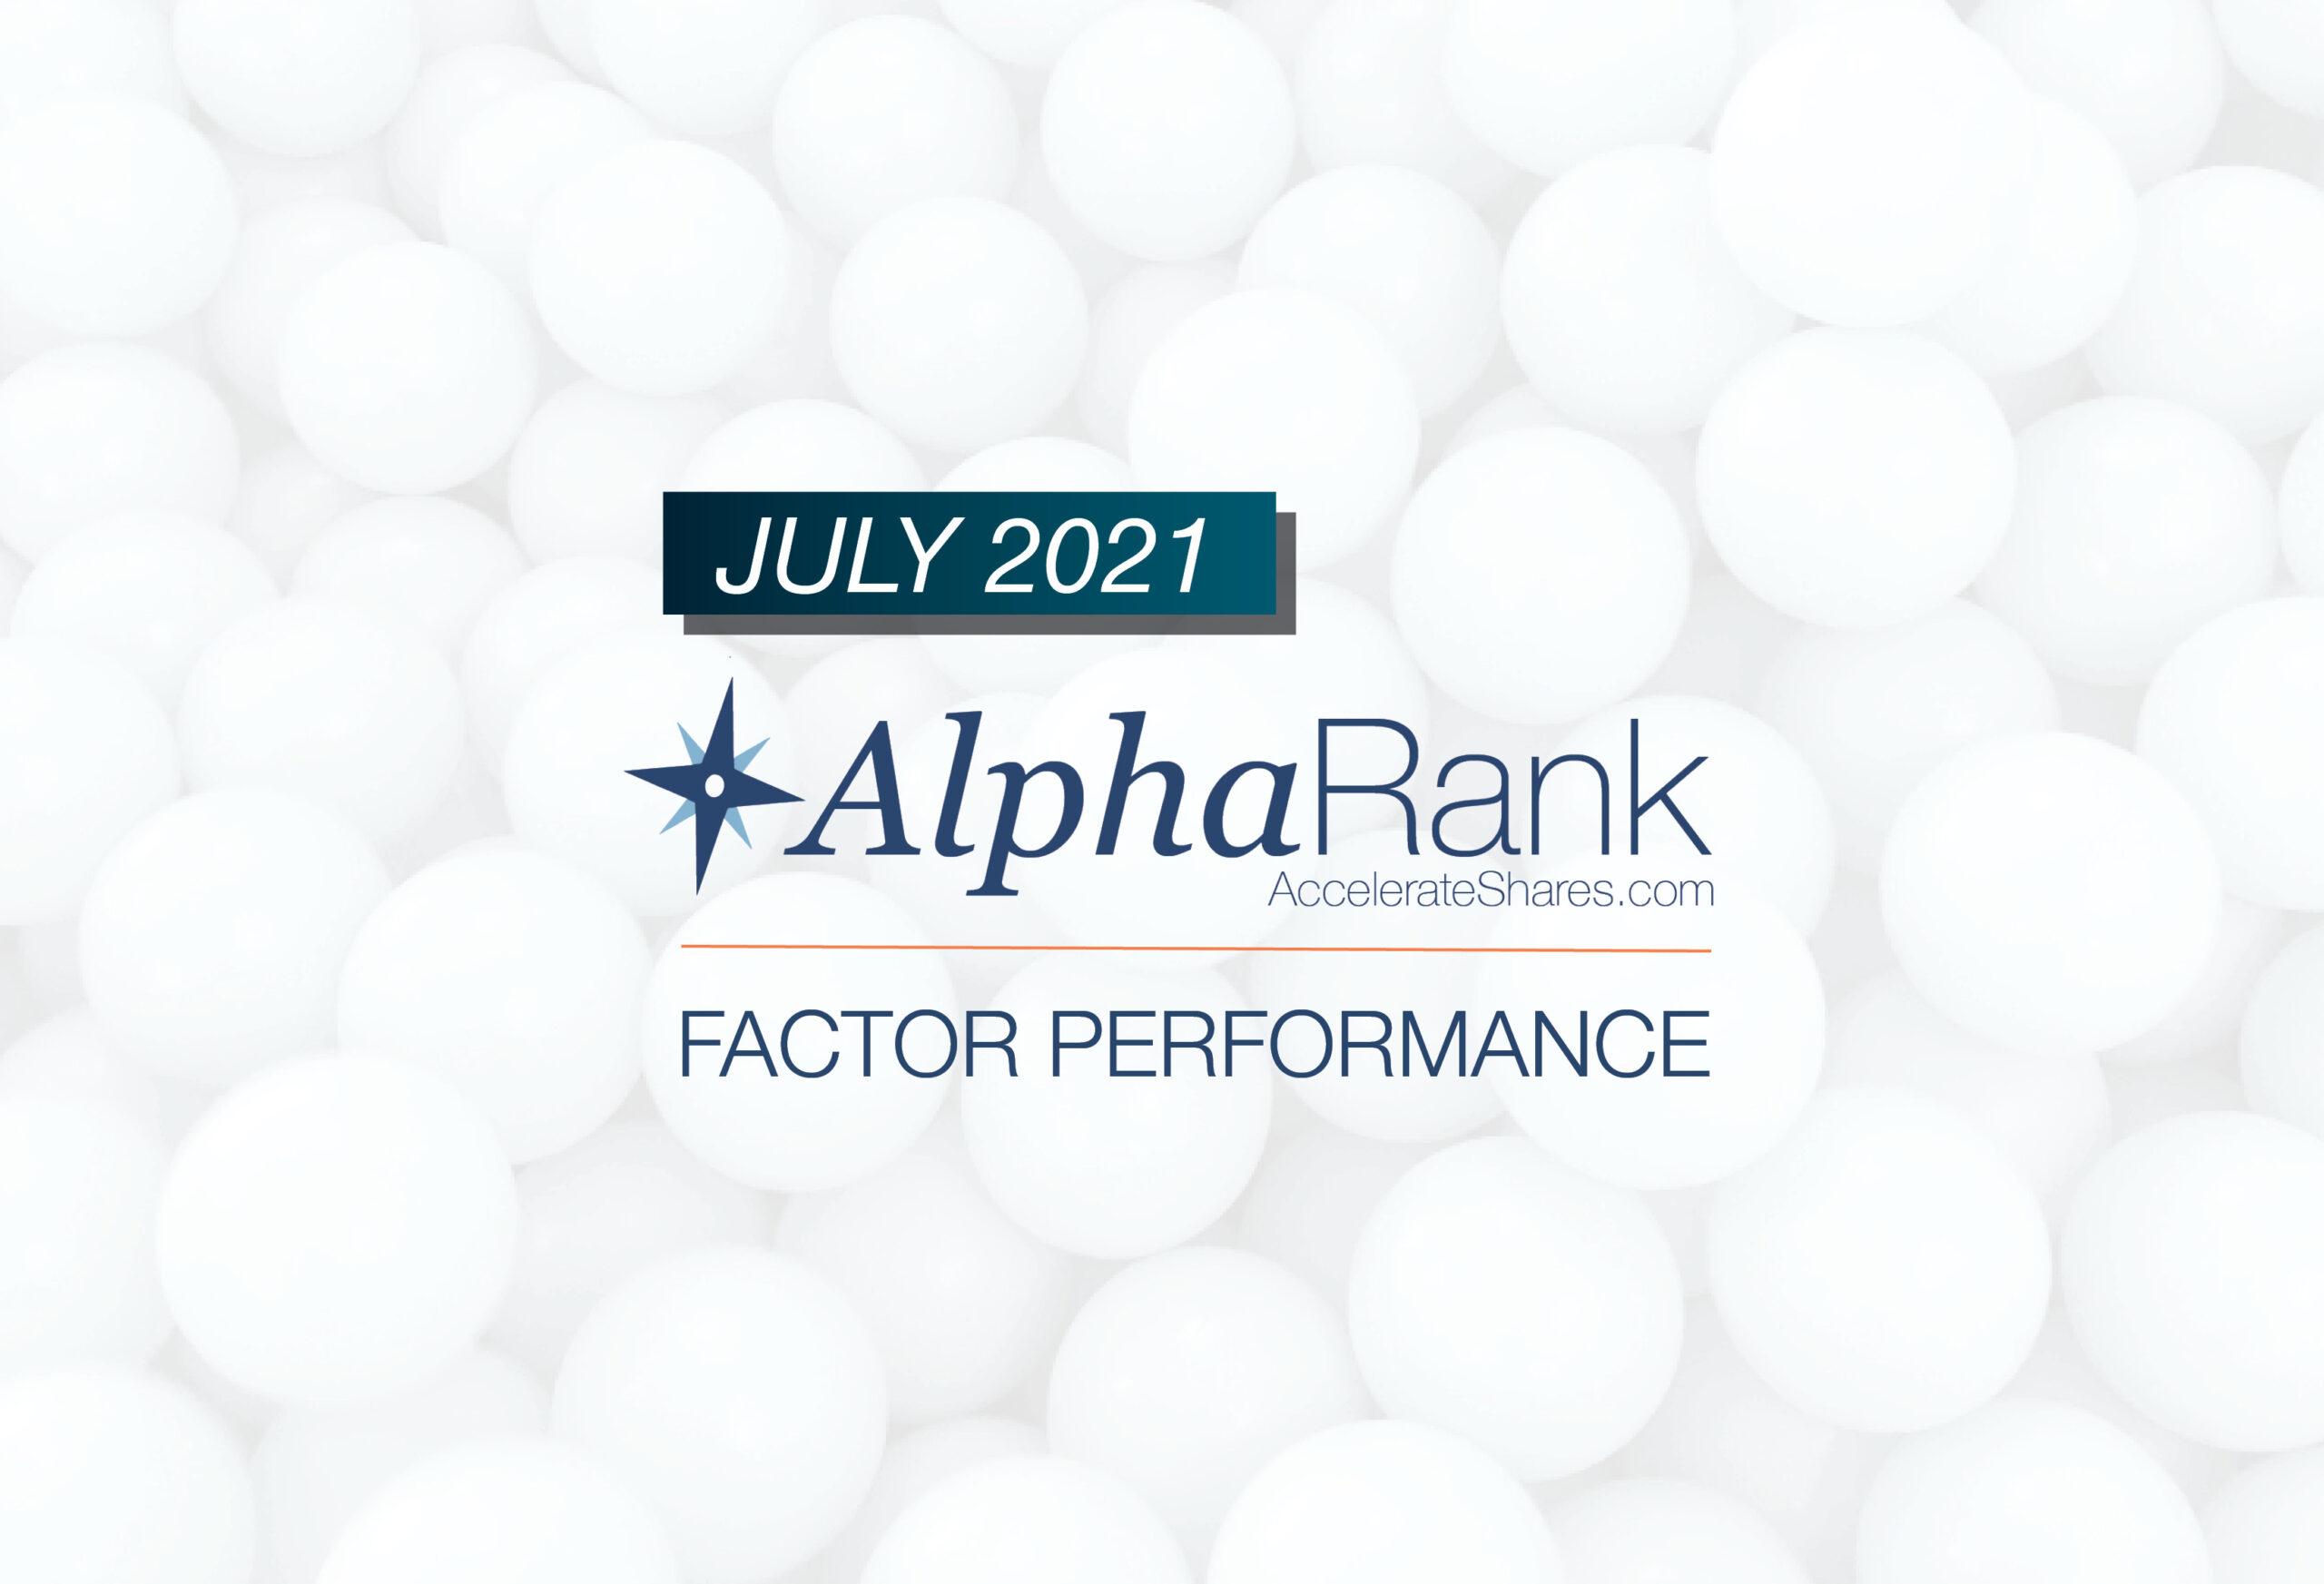 AlphaRank Factor Performance- July 2021